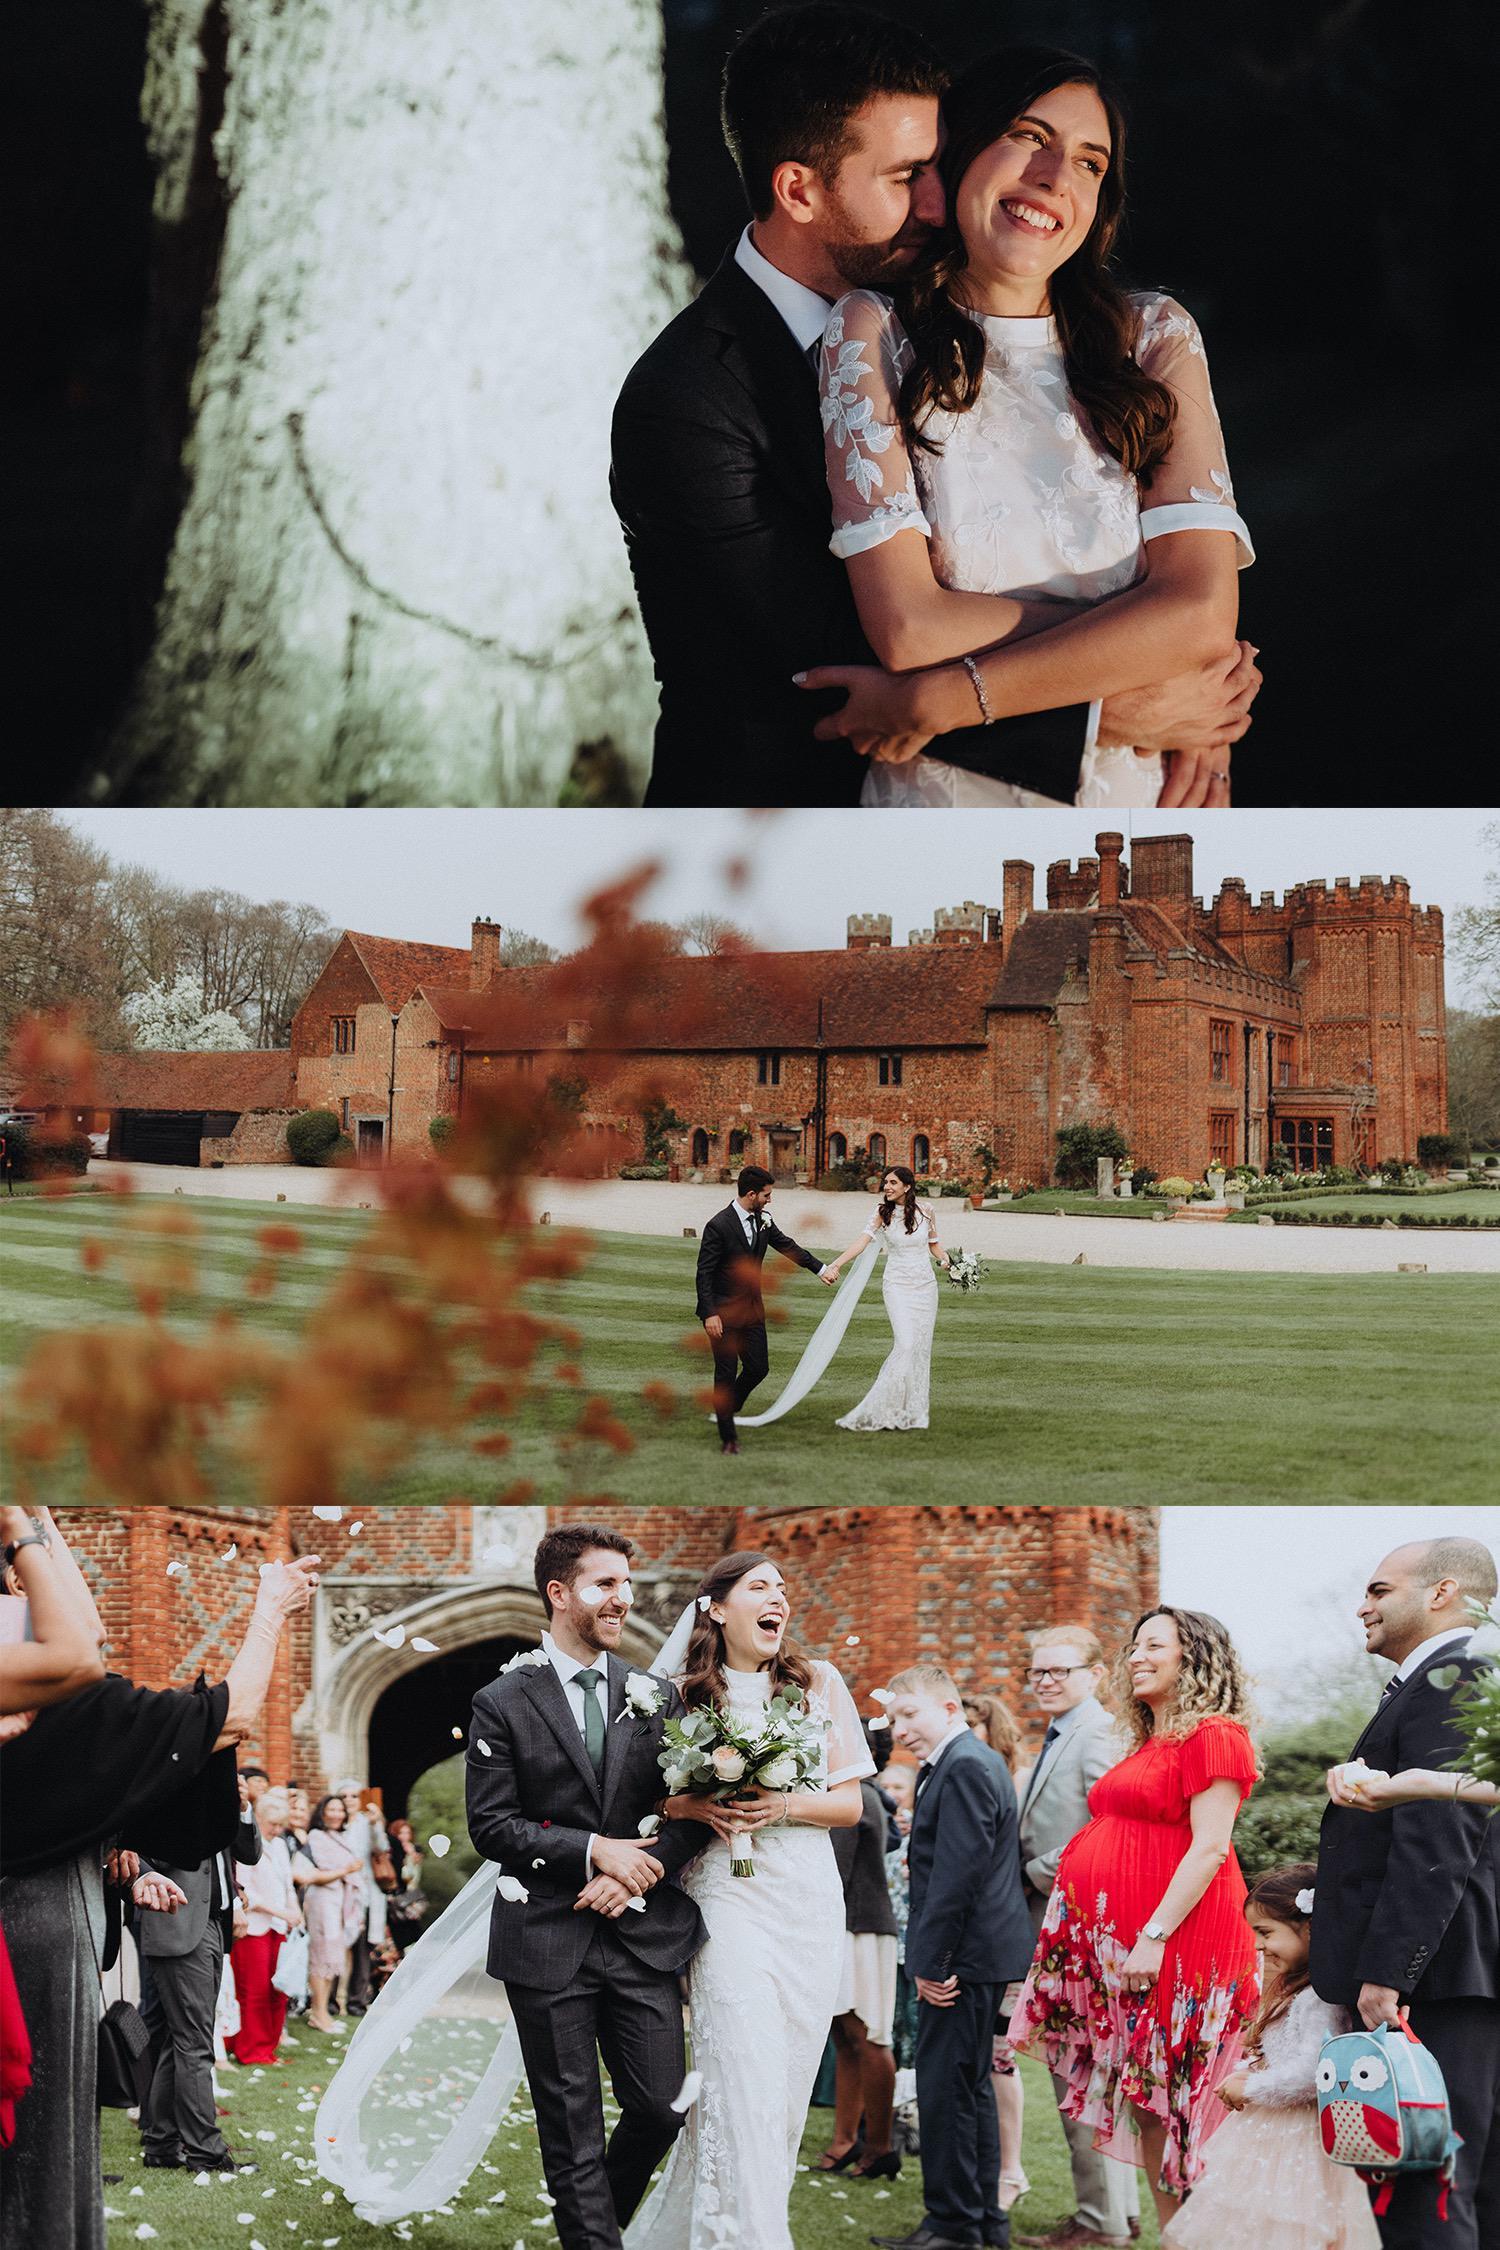 Leez-Priory-Wedding-Photographer-Paul-Liddement.jpg